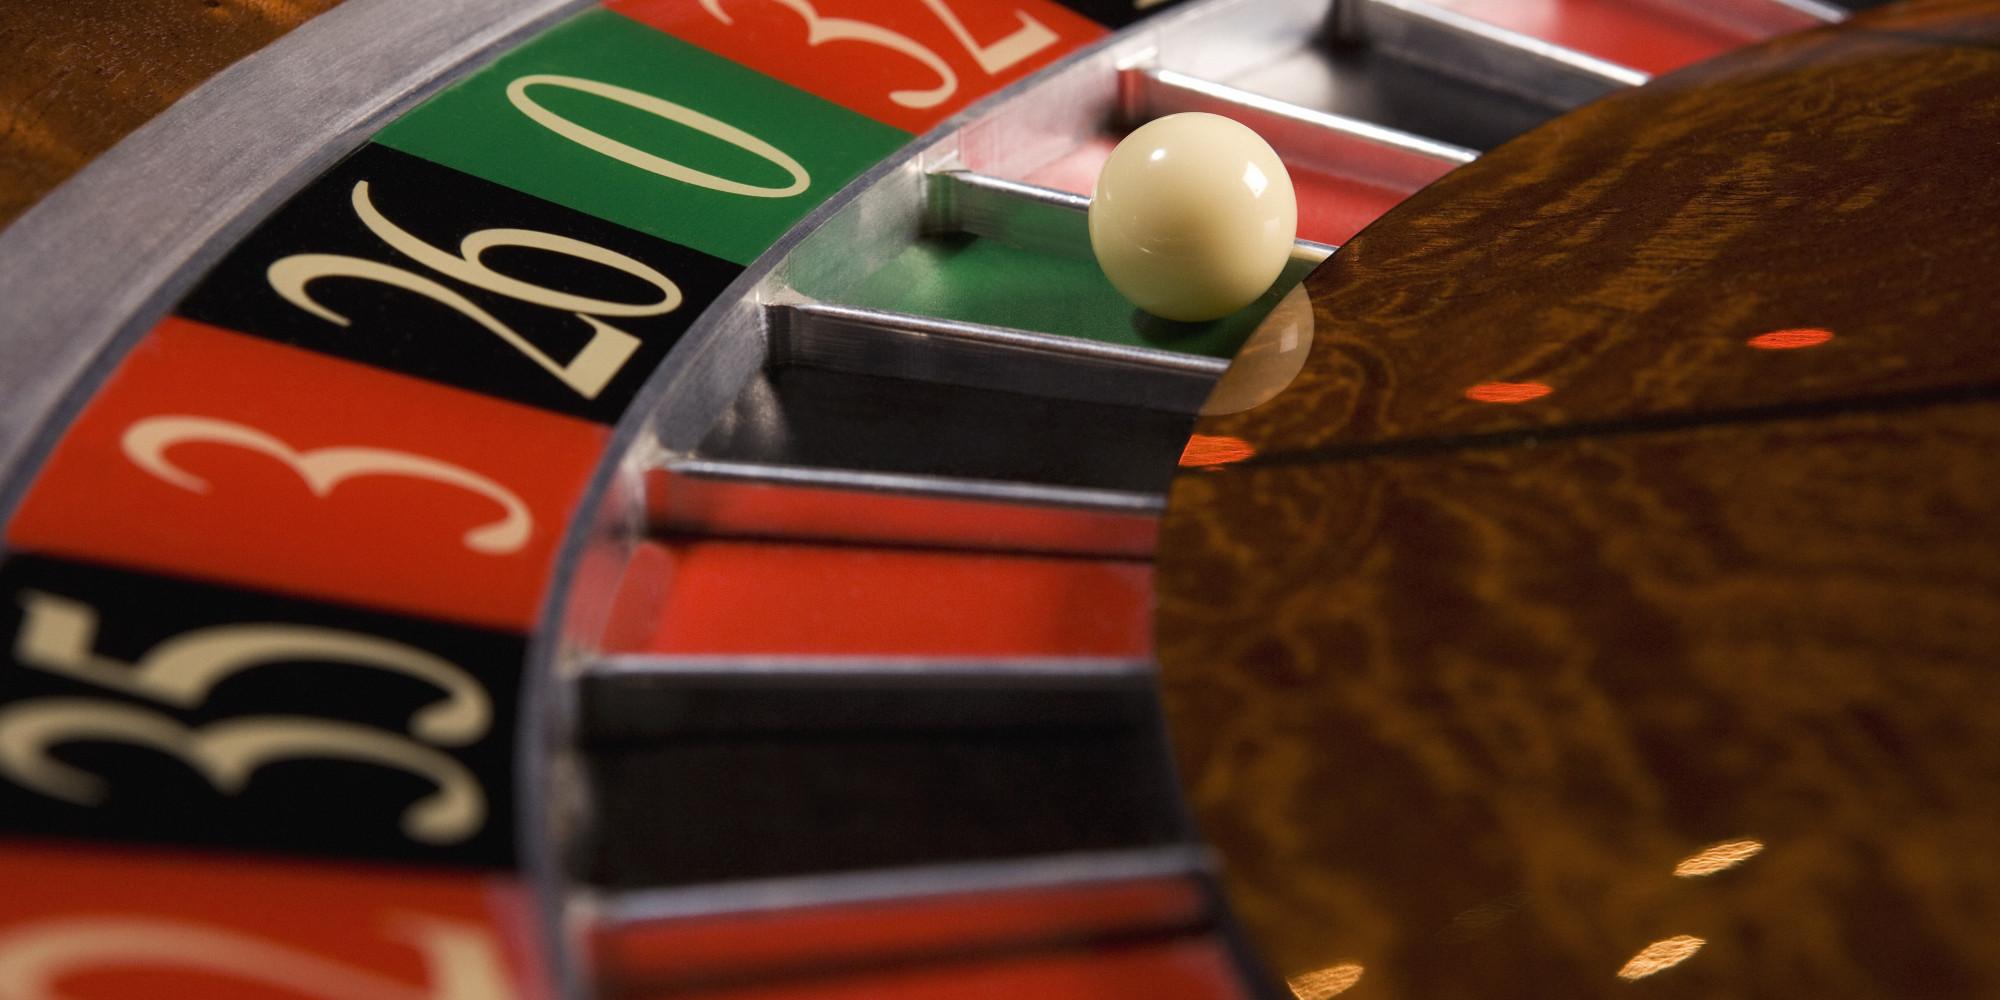 одна казино копейка